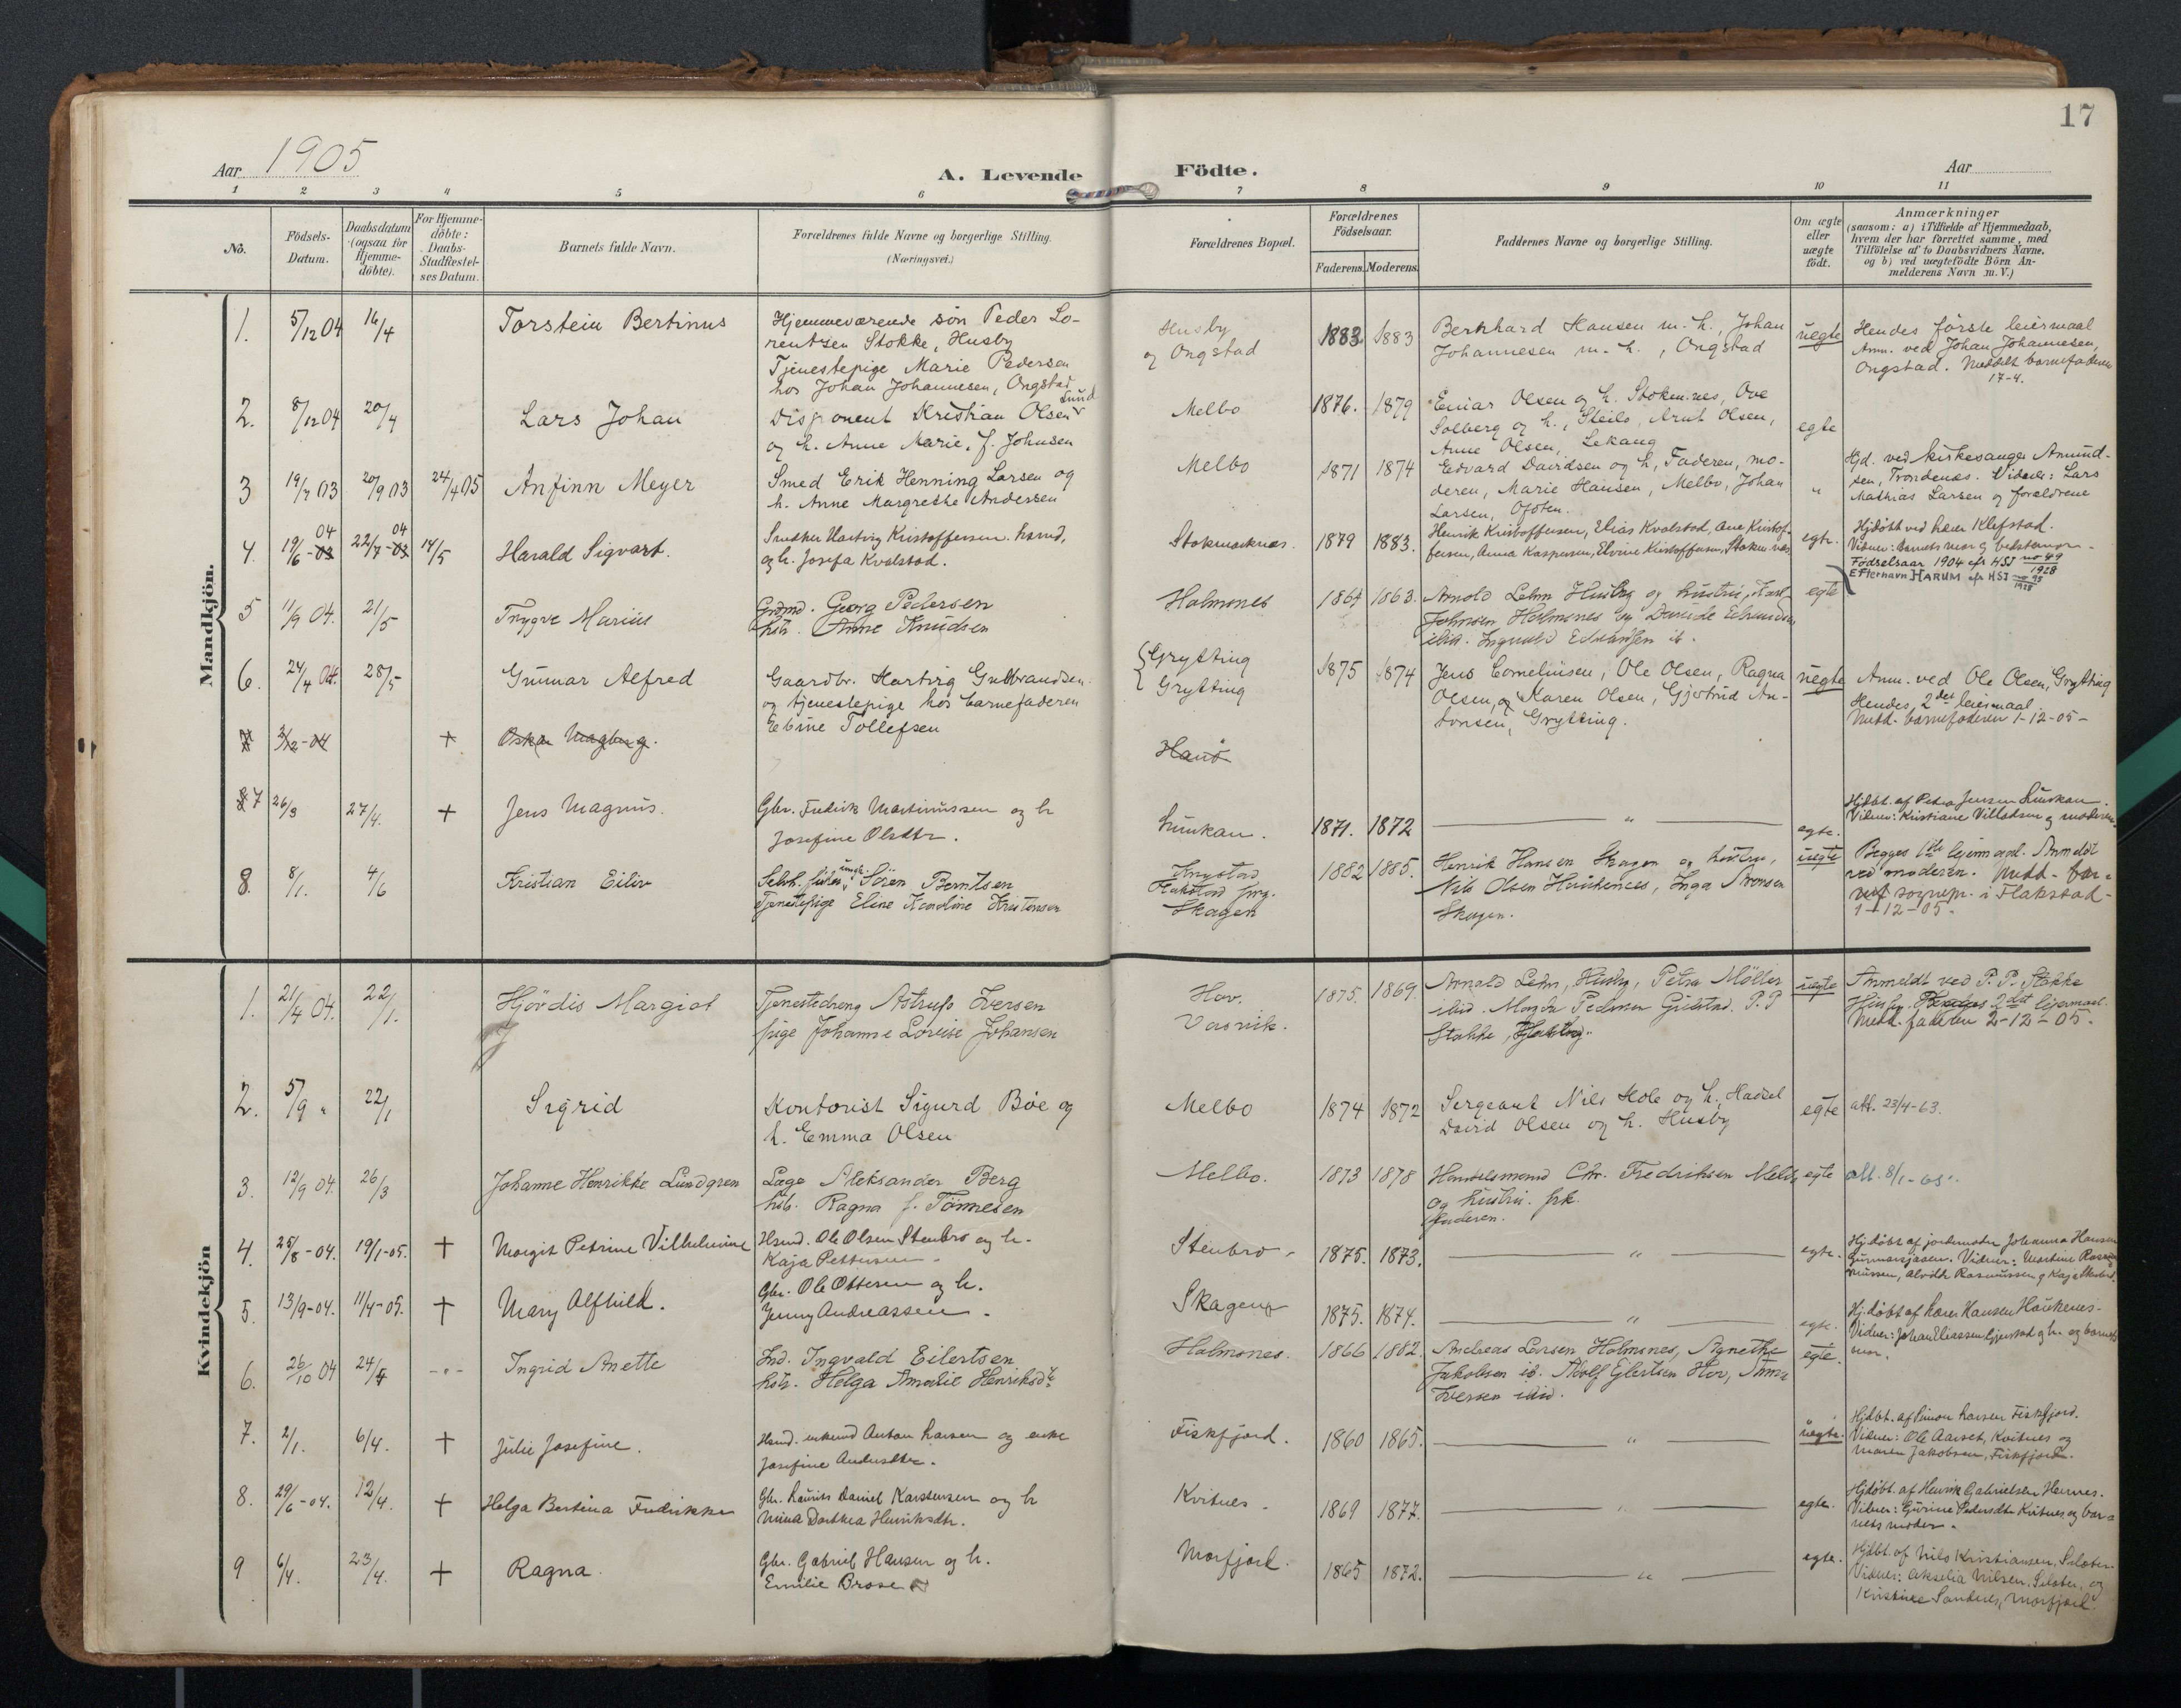 SAT, Ministerialprotokoller, klokkerbøker og fødselsregistre - Nordland, 888/L1248: Ministerialbok nr. 888A14, 1904-1913, s. 17